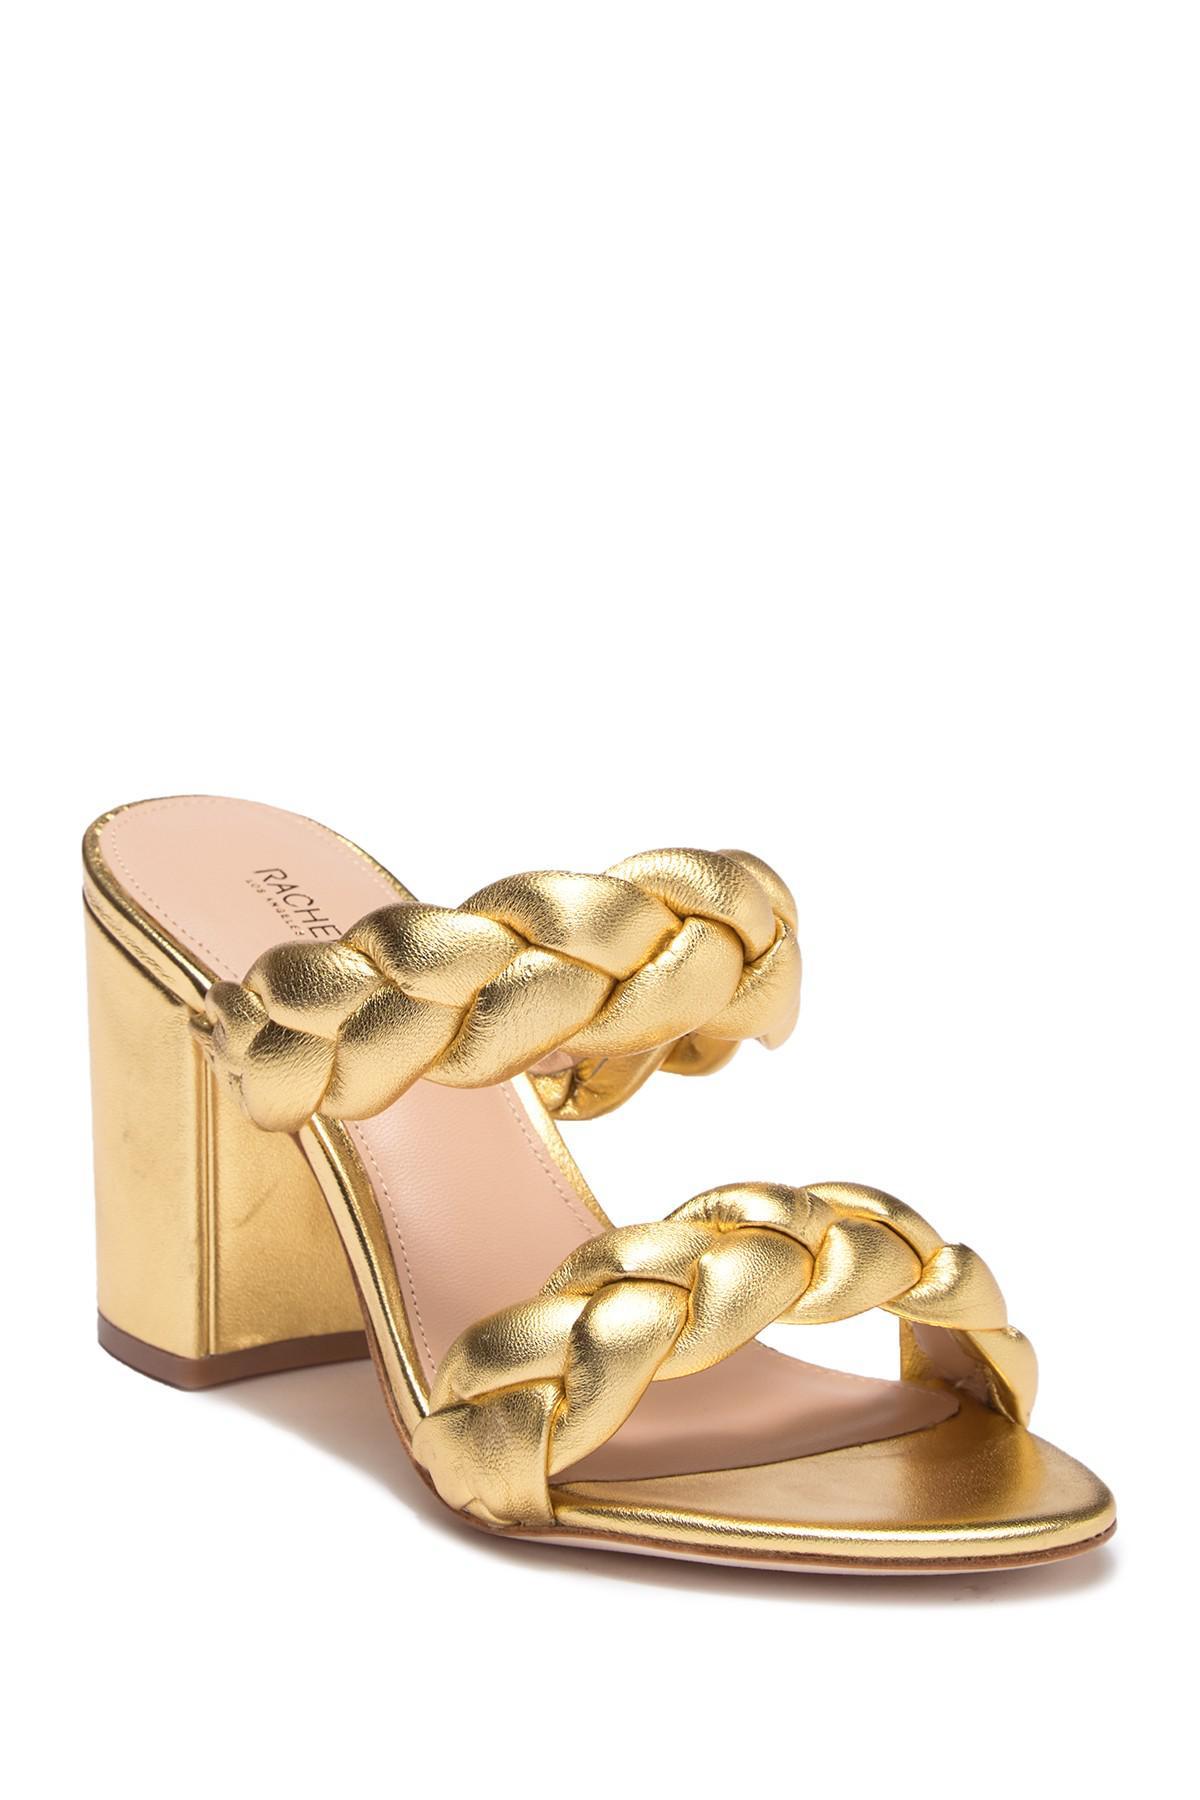 Rachel Zoe Demi Metallic Nappa Braid Sandal